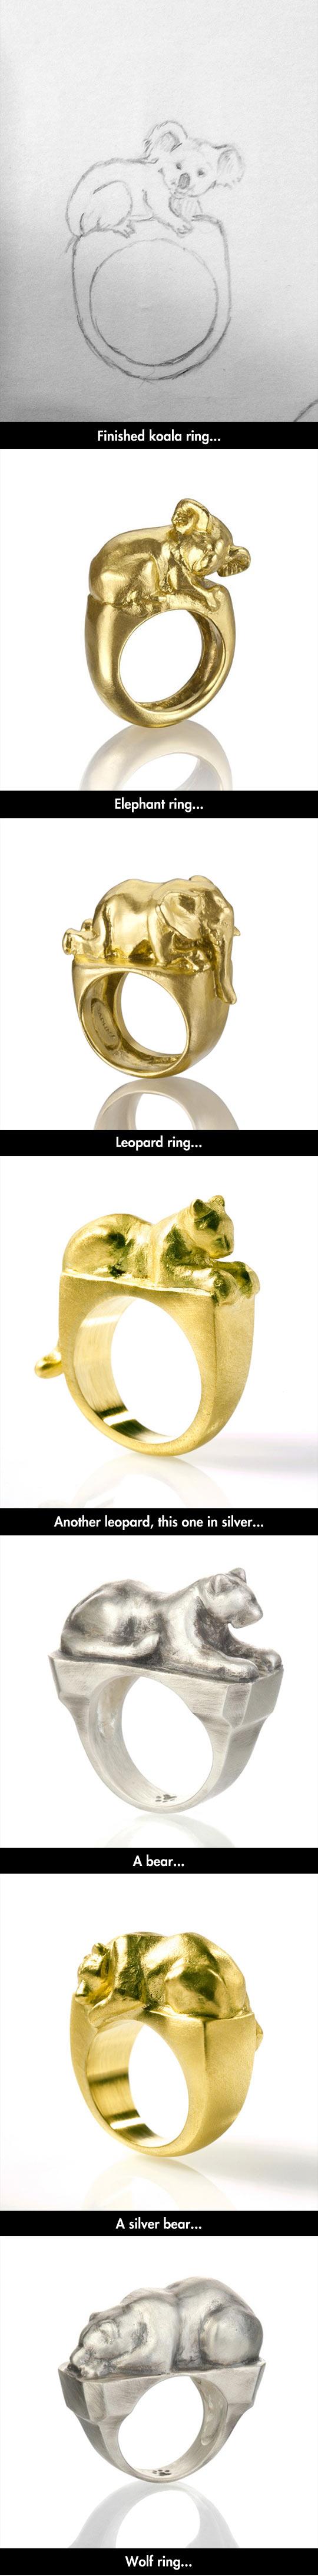 funny-wax-box-jewelry-rings-elephant